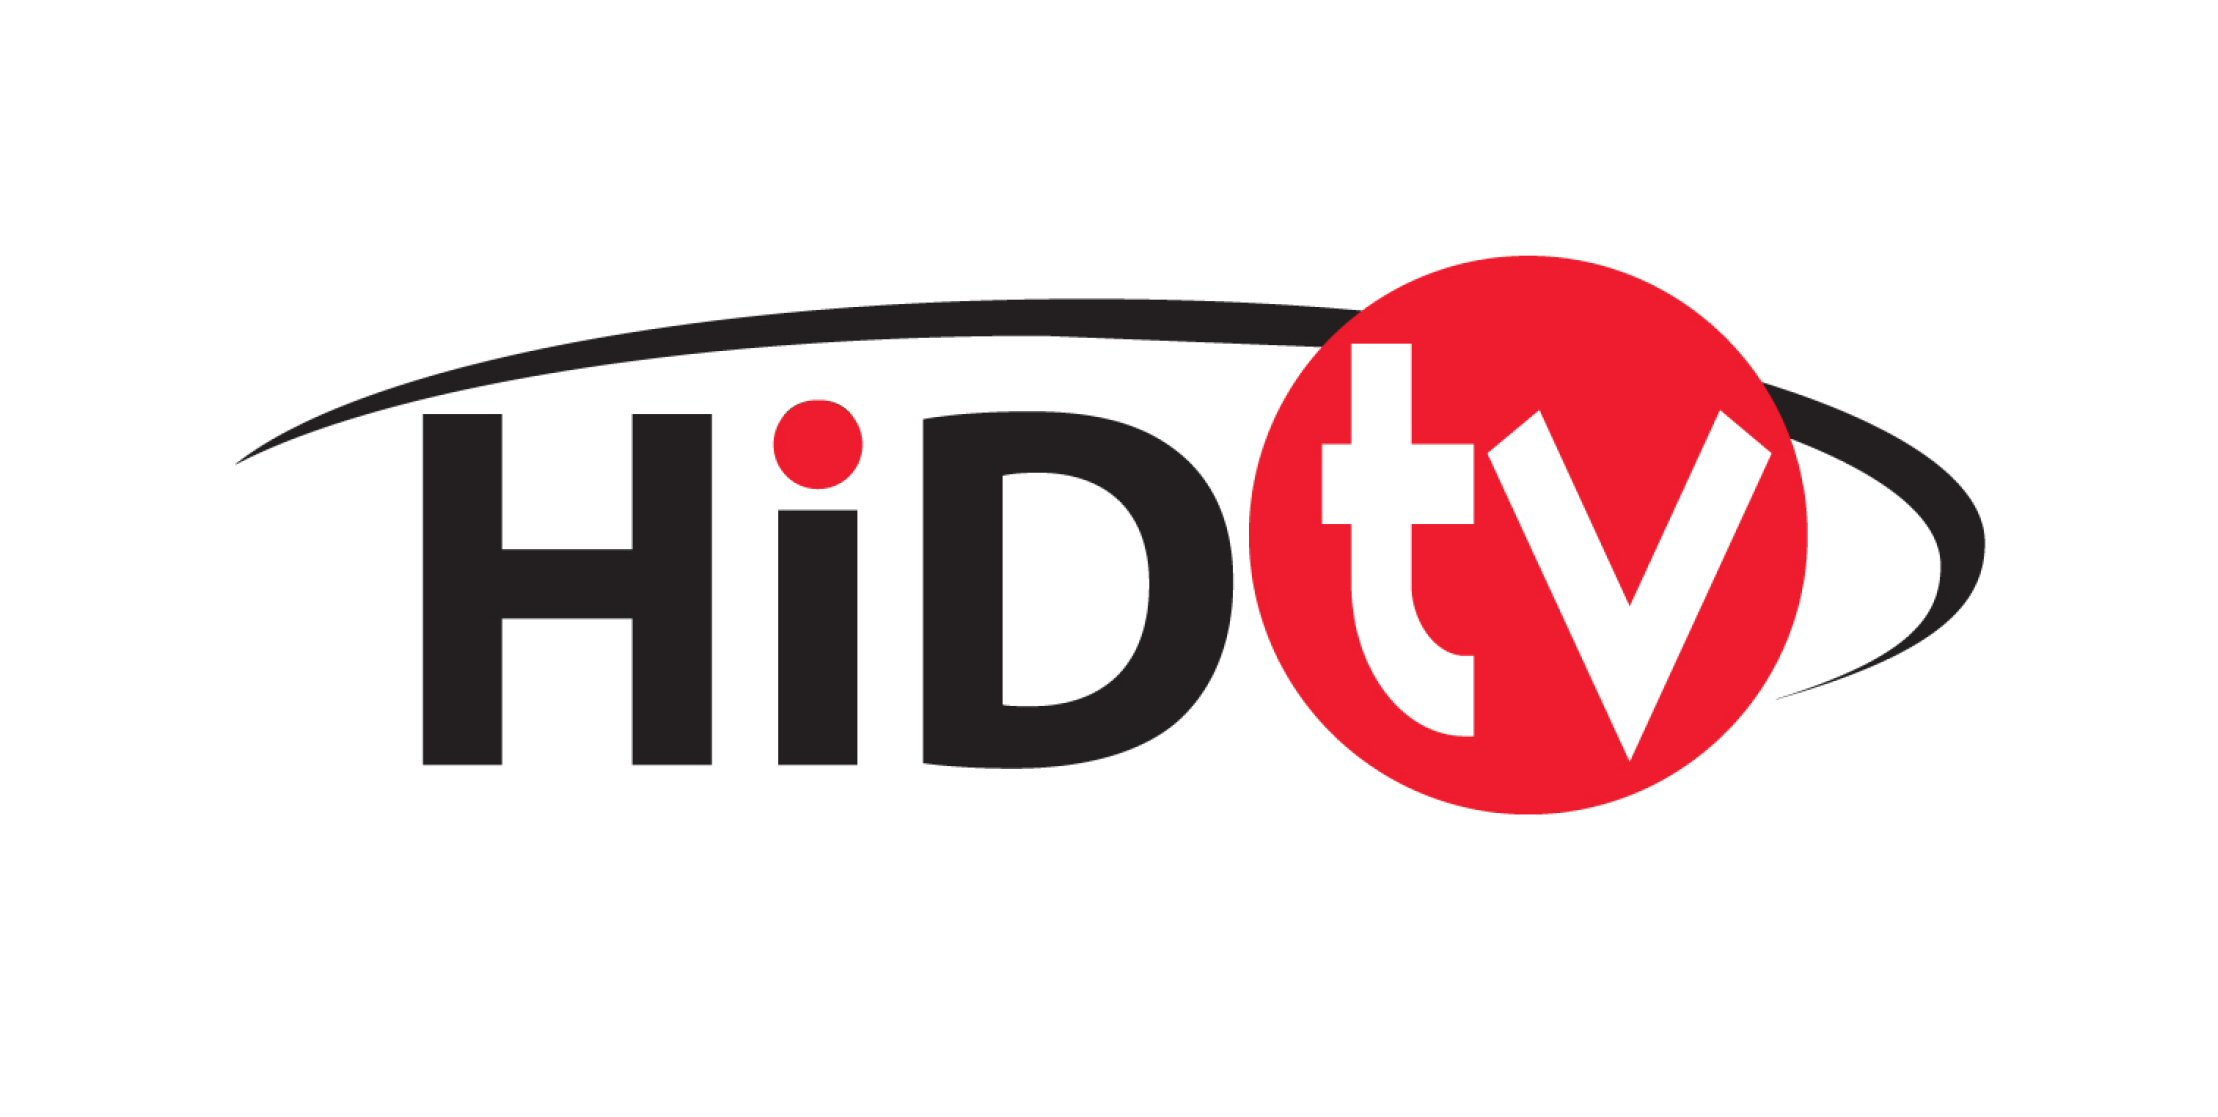 HiDTVLogo